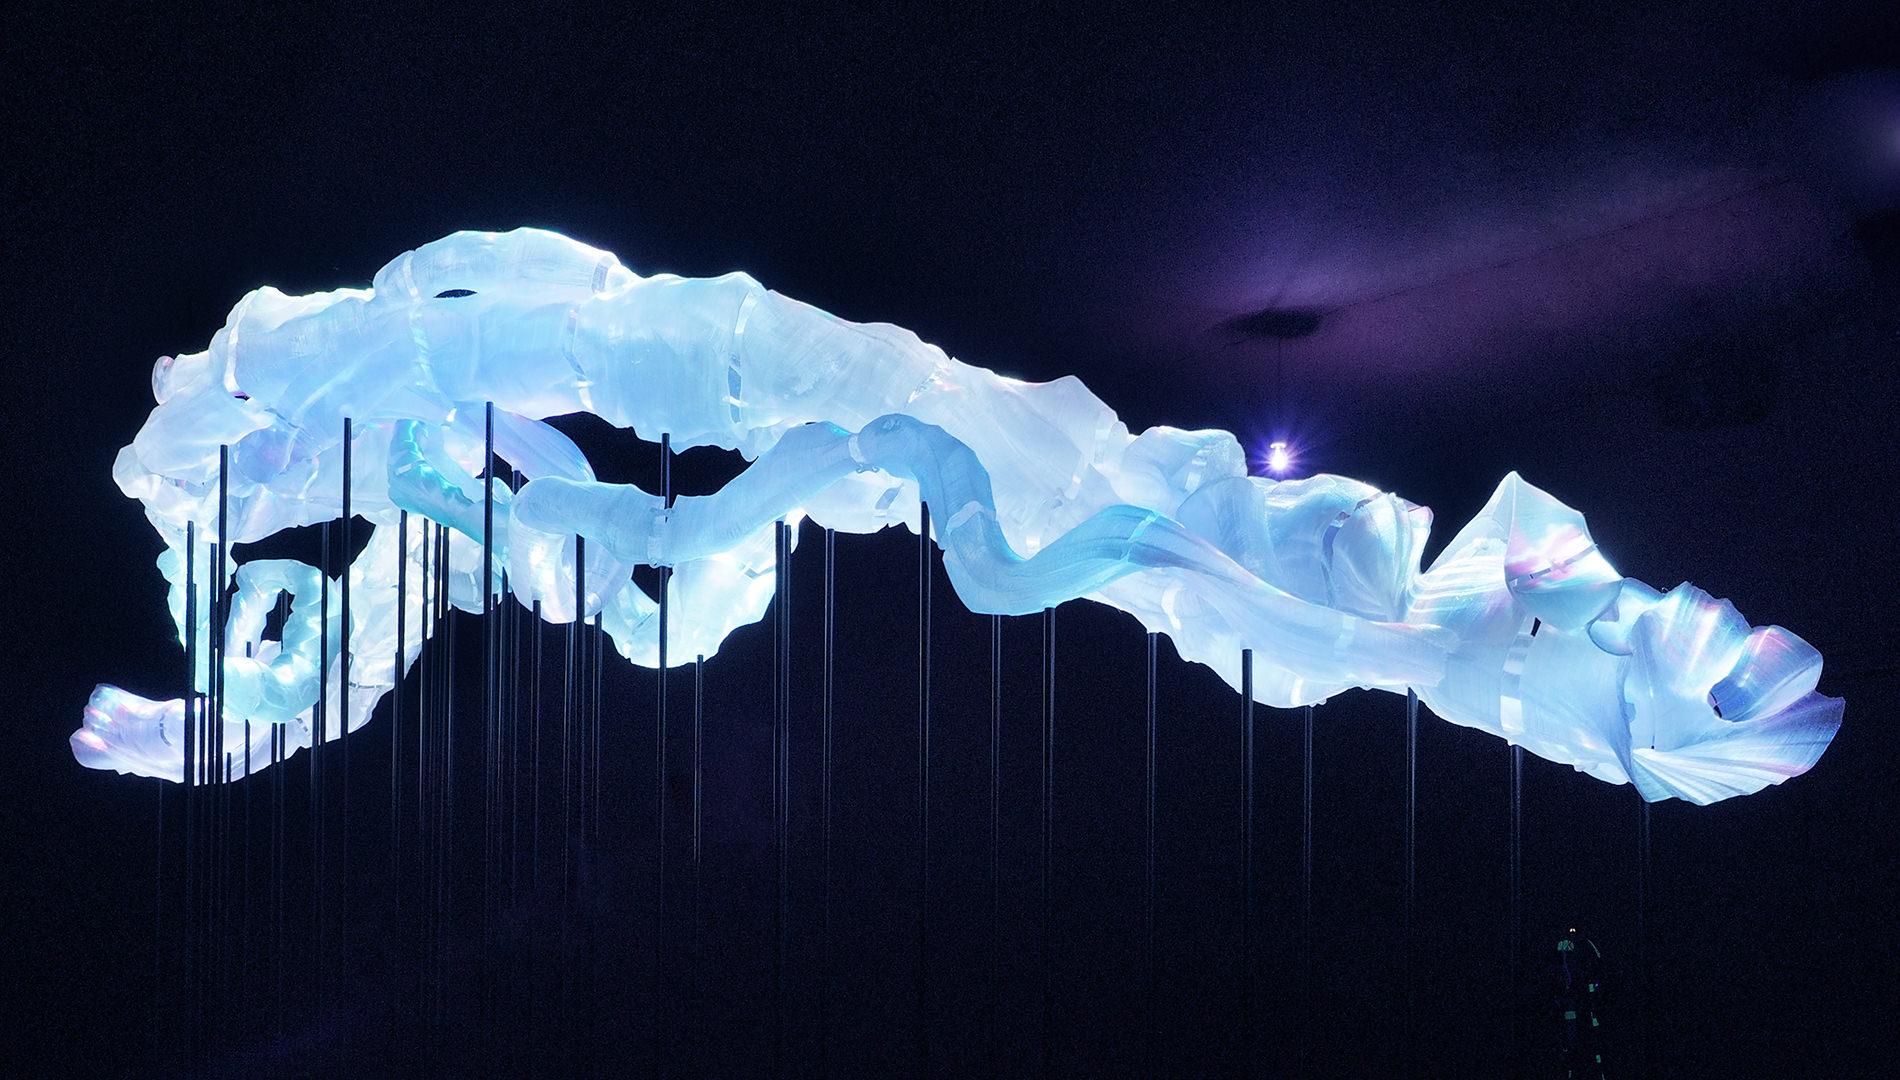 Messe Design Live Kommunikation Köln Mülheim Carlswerk Olympus Perspective Playground Skulptur Going Places EventLabs